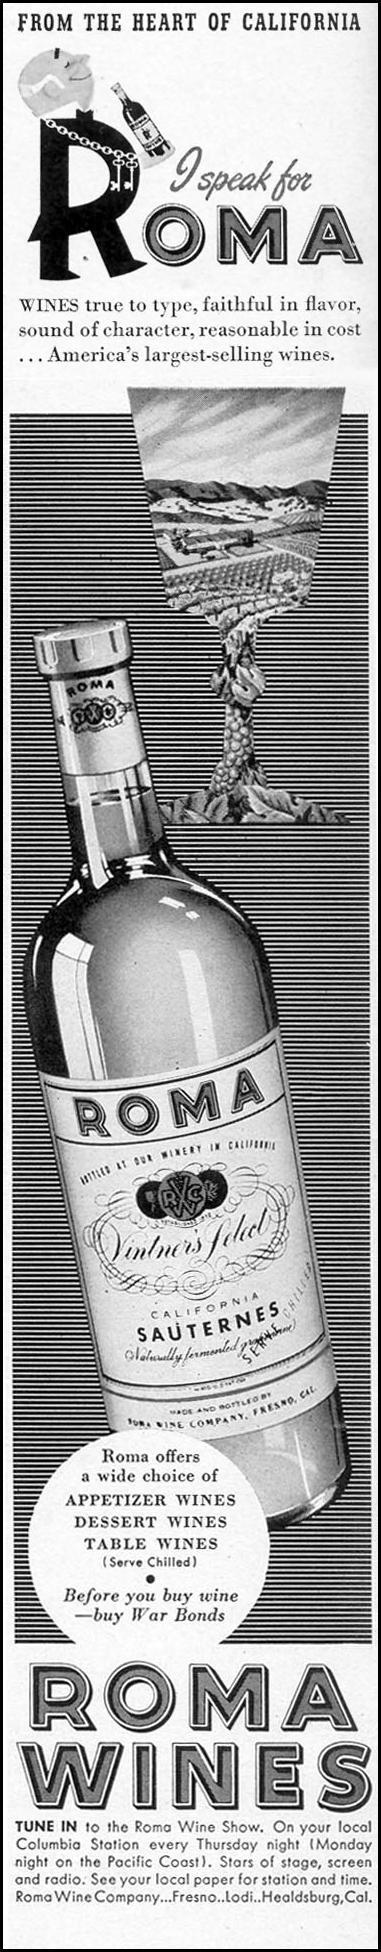 ROMA WINES LIFE 02/21/1944 p. 2